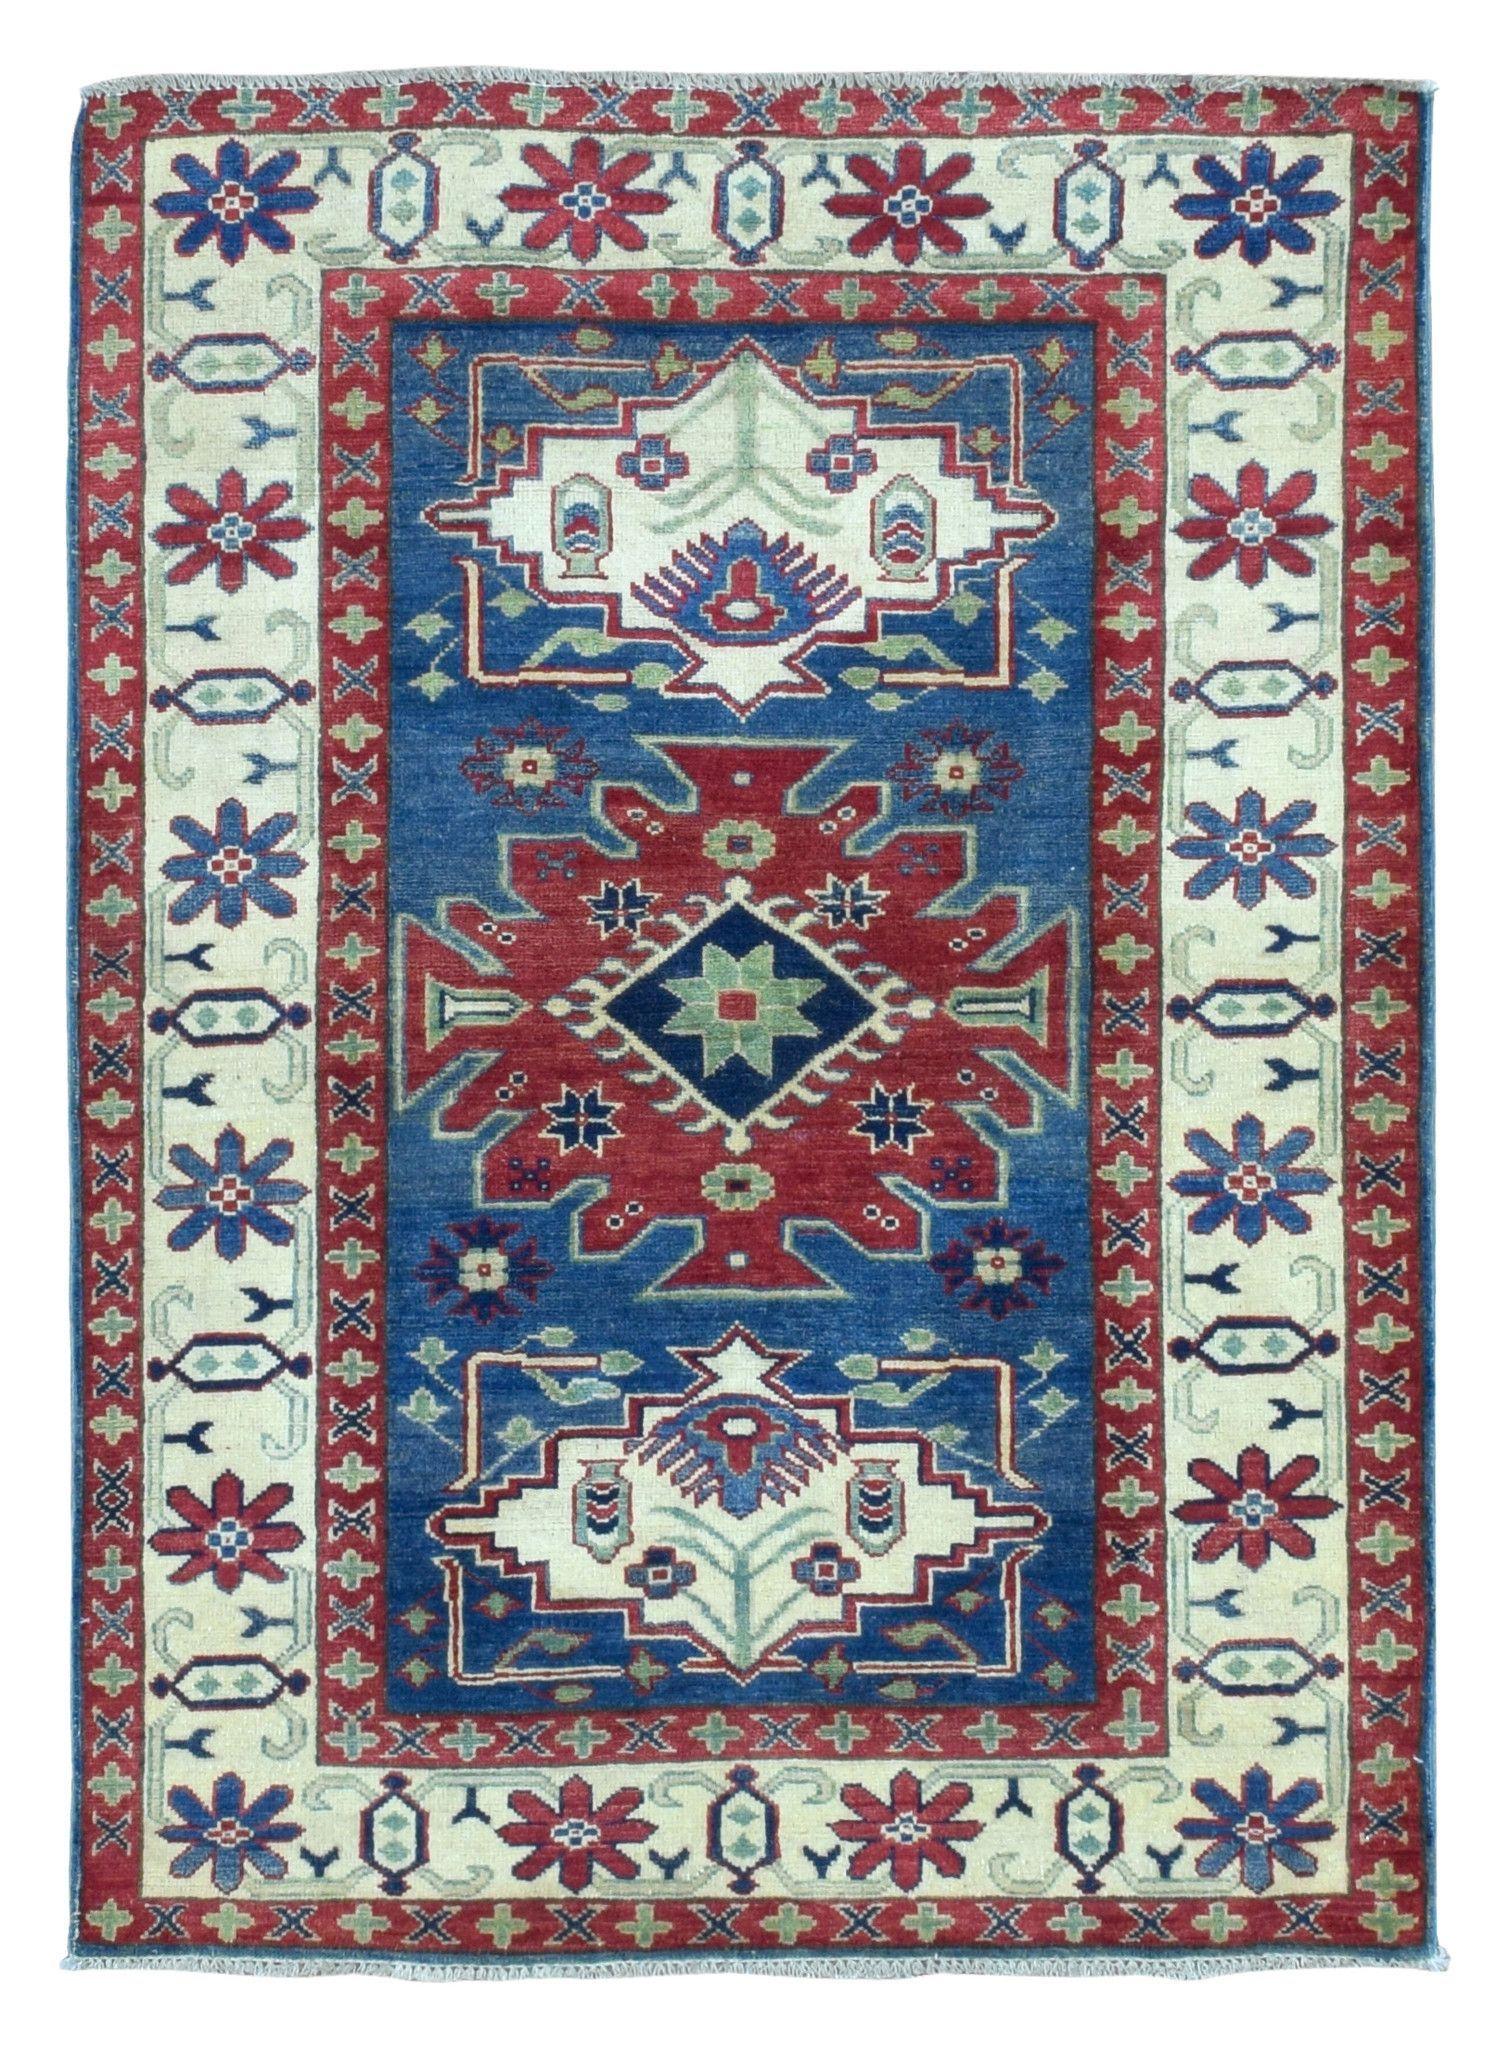 Small Pakistan Kazak Oriental Rug 4x5 4 Motivos Turcos